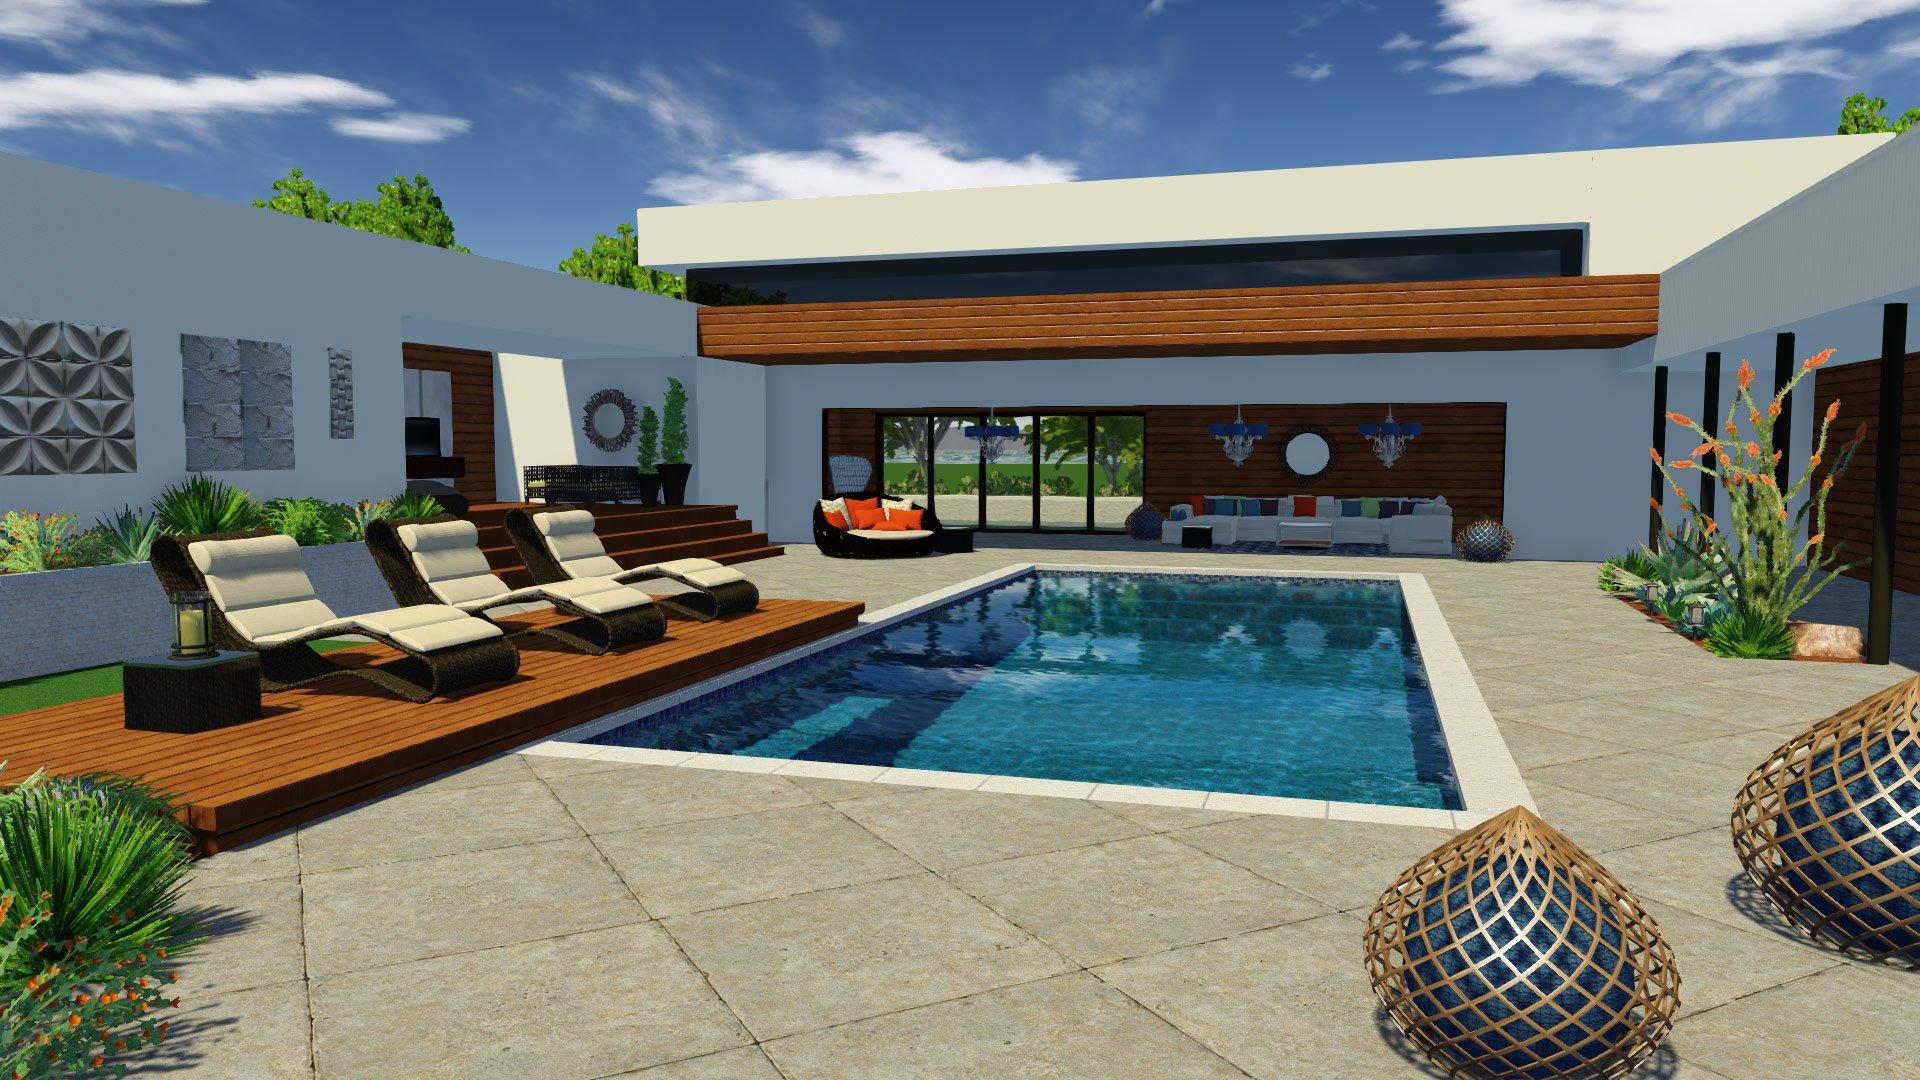 Pool Deck Size